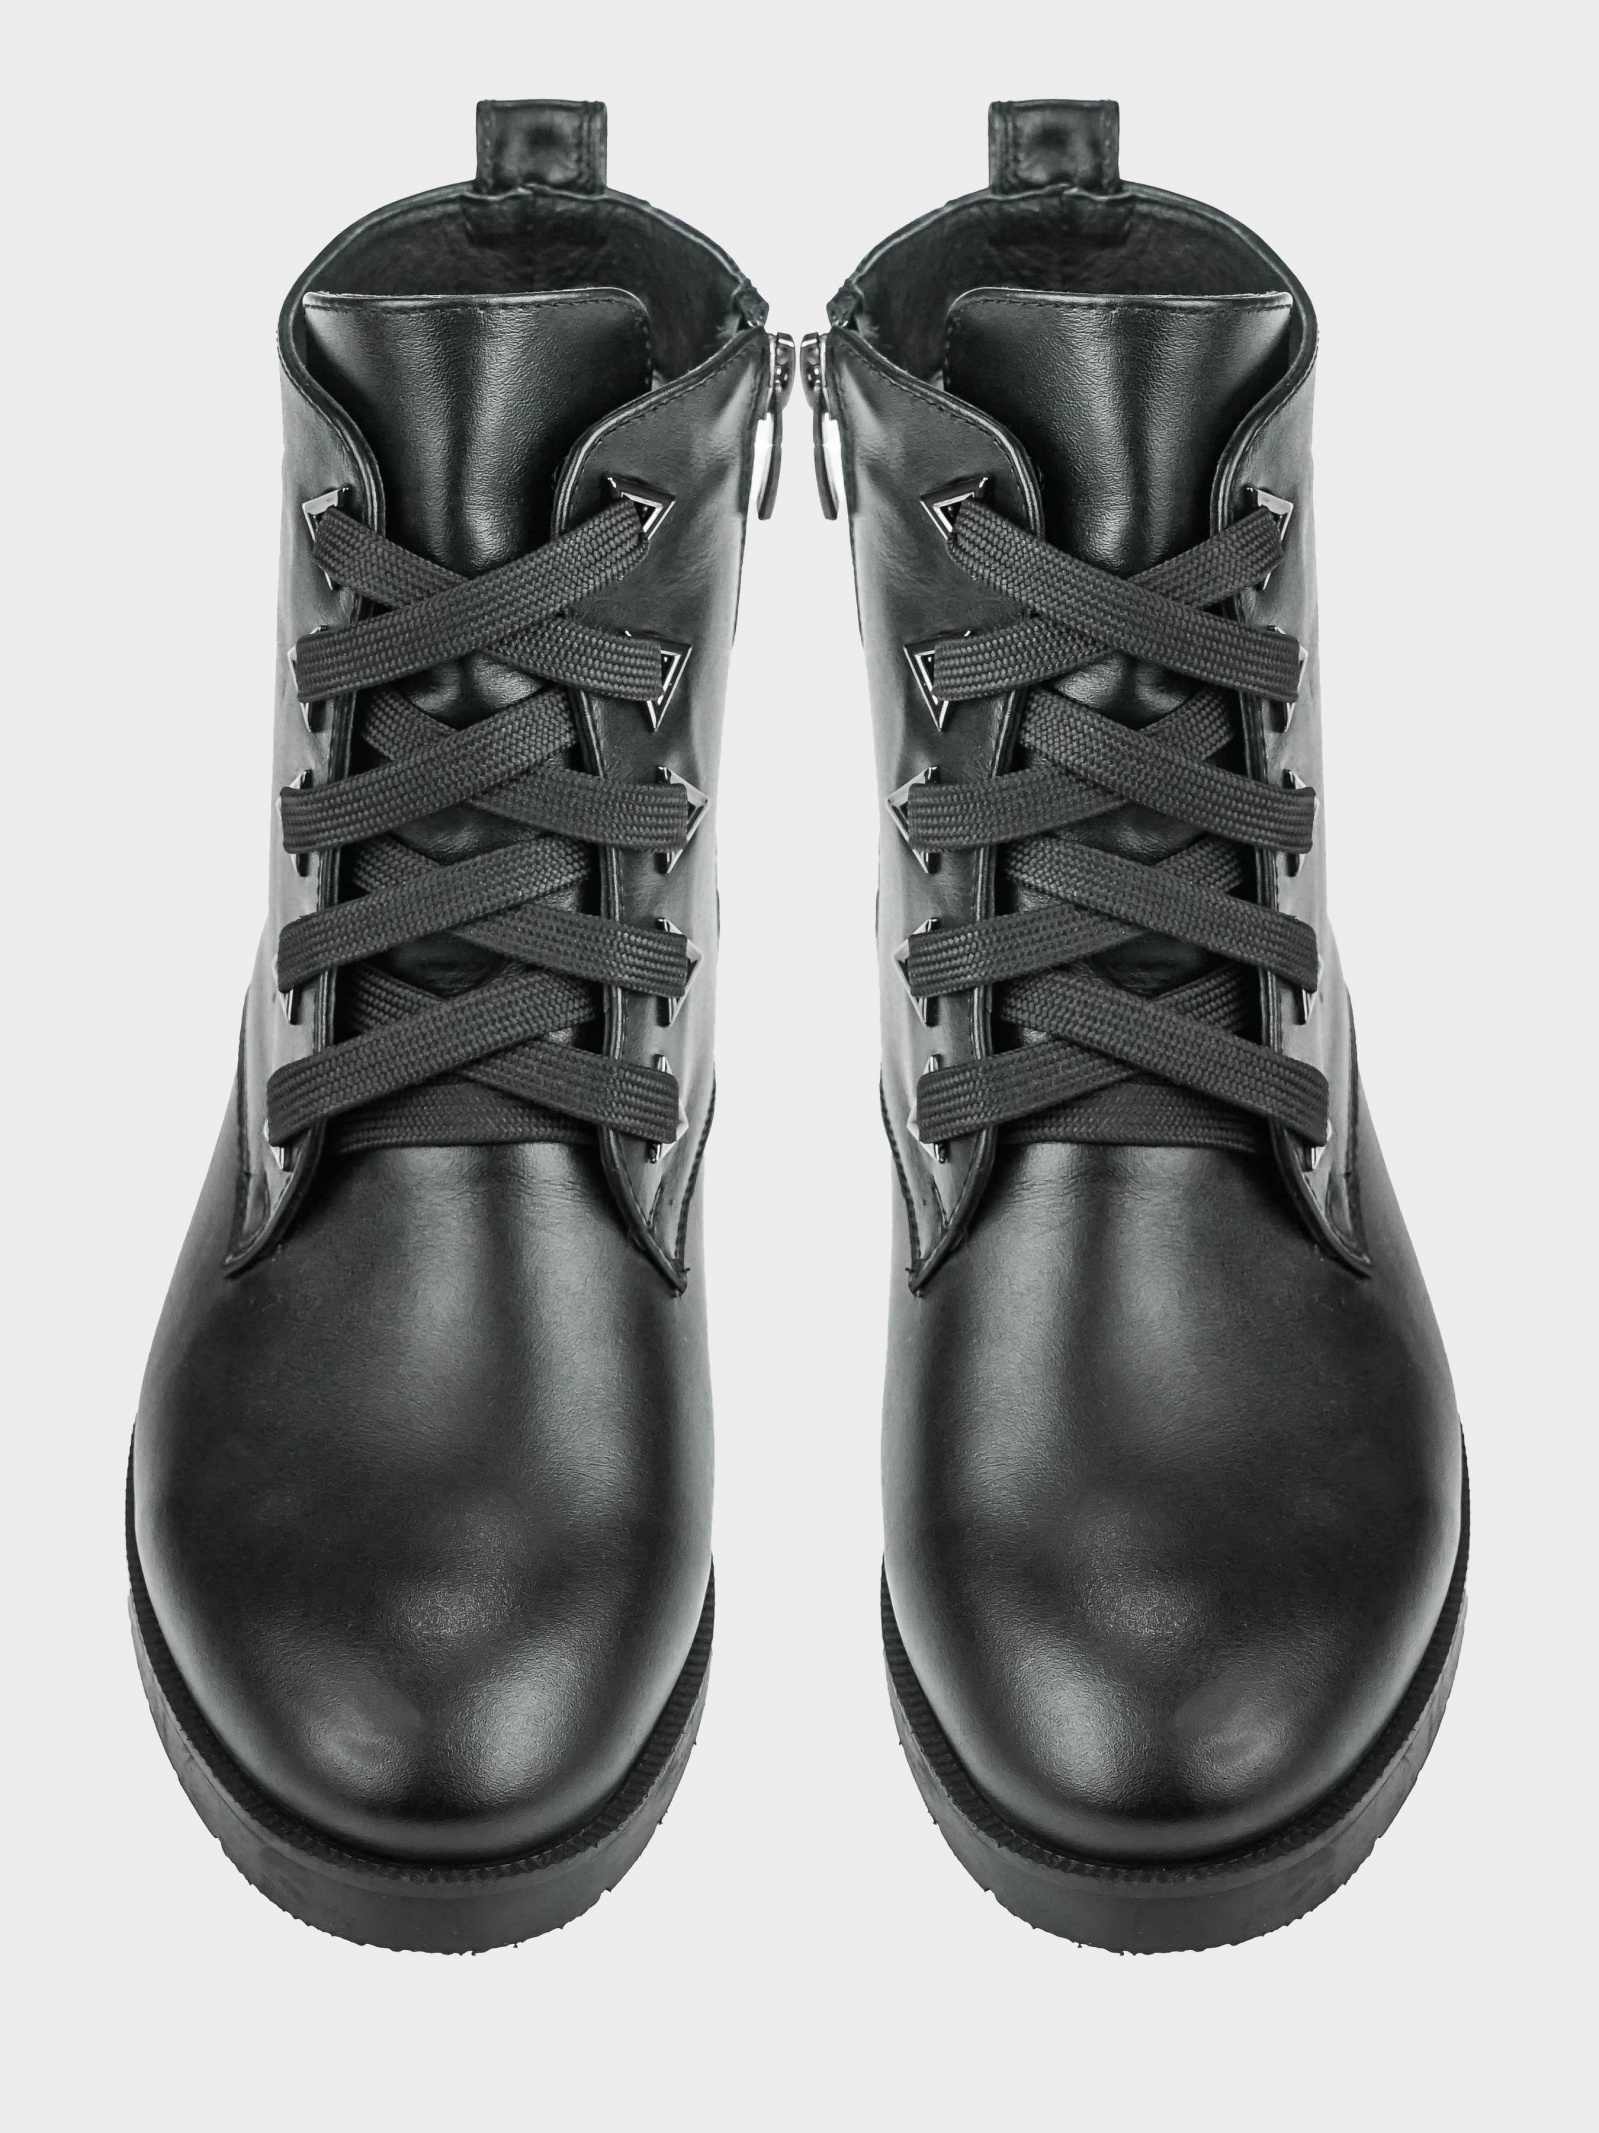 Ботинки женские Ботинки LZ3310-01 размеры обуви, 2017